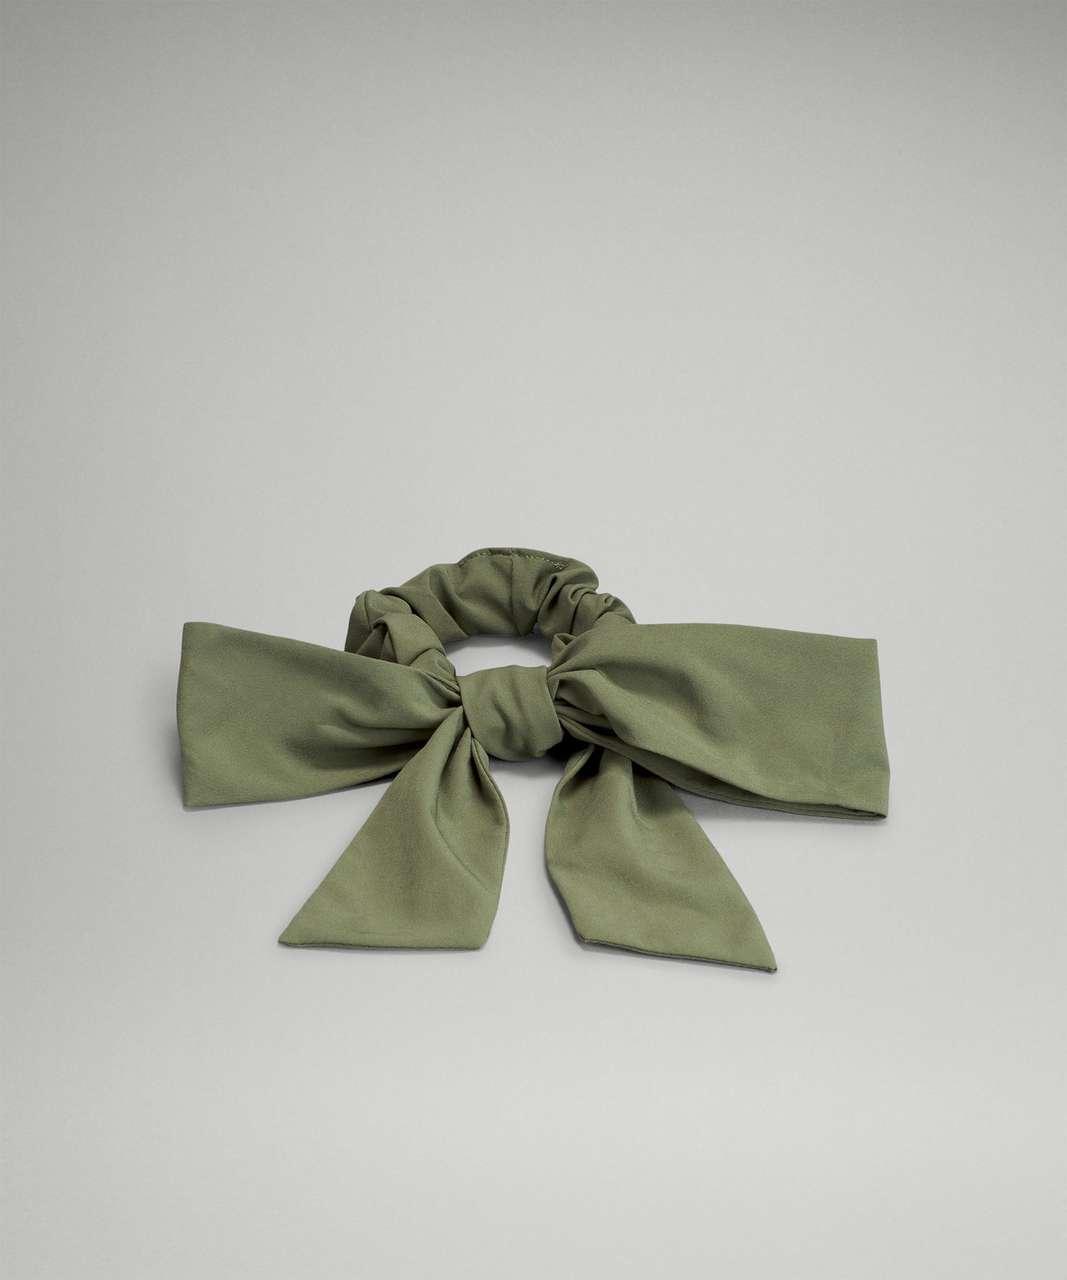 Lululemon Uplifting Scrunchie *Big Bow - Green Twill